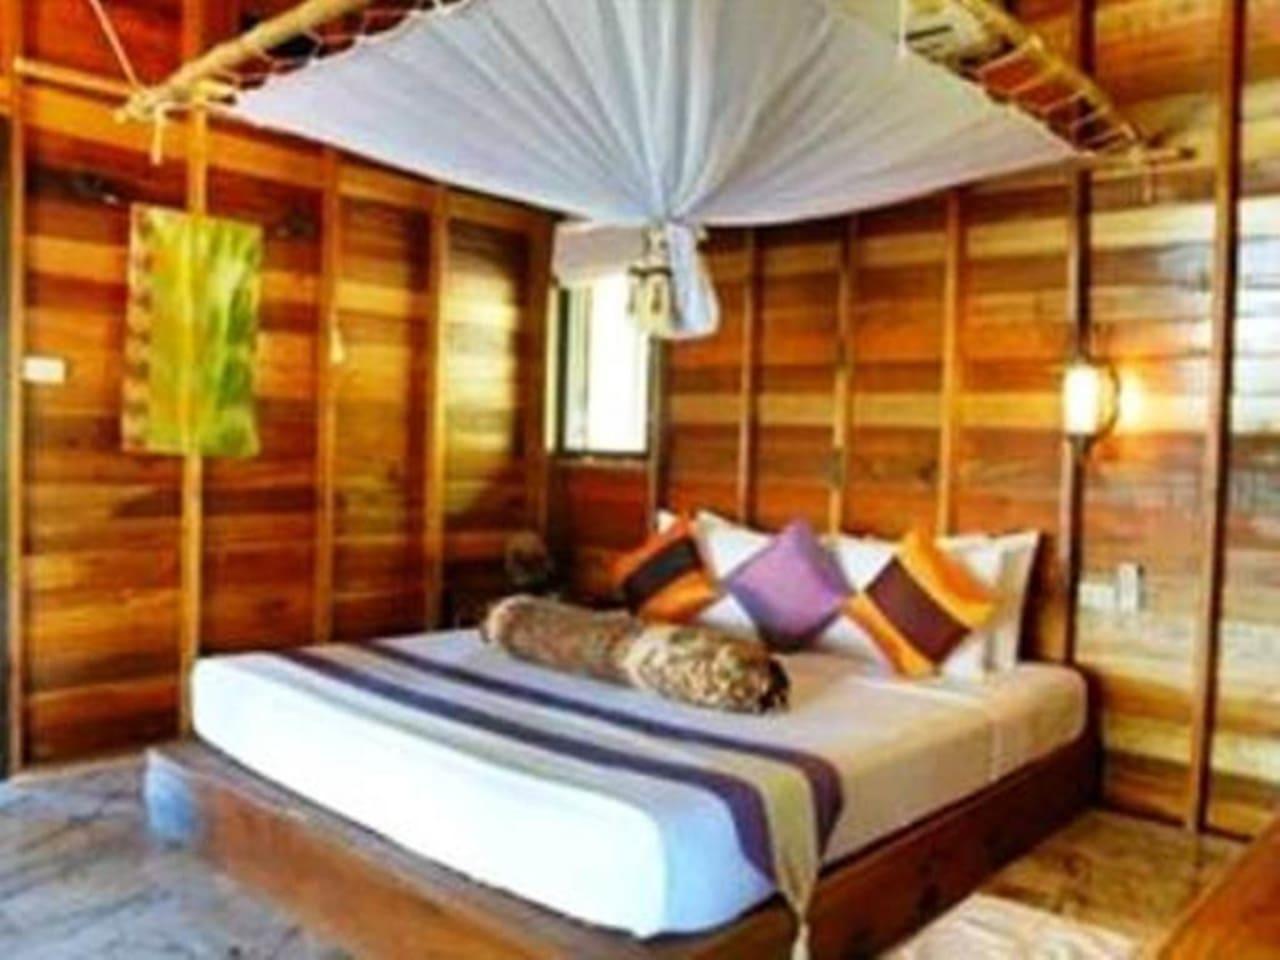 Romantic Seaview Suite with Beachfront in Ko Tao อพาร์ตเมนต์ 1 ห้องนอน 1 ห้องน้ำส่วนตัว ขนาด 52 ตร.ม. – อ่าวจันทร์สม